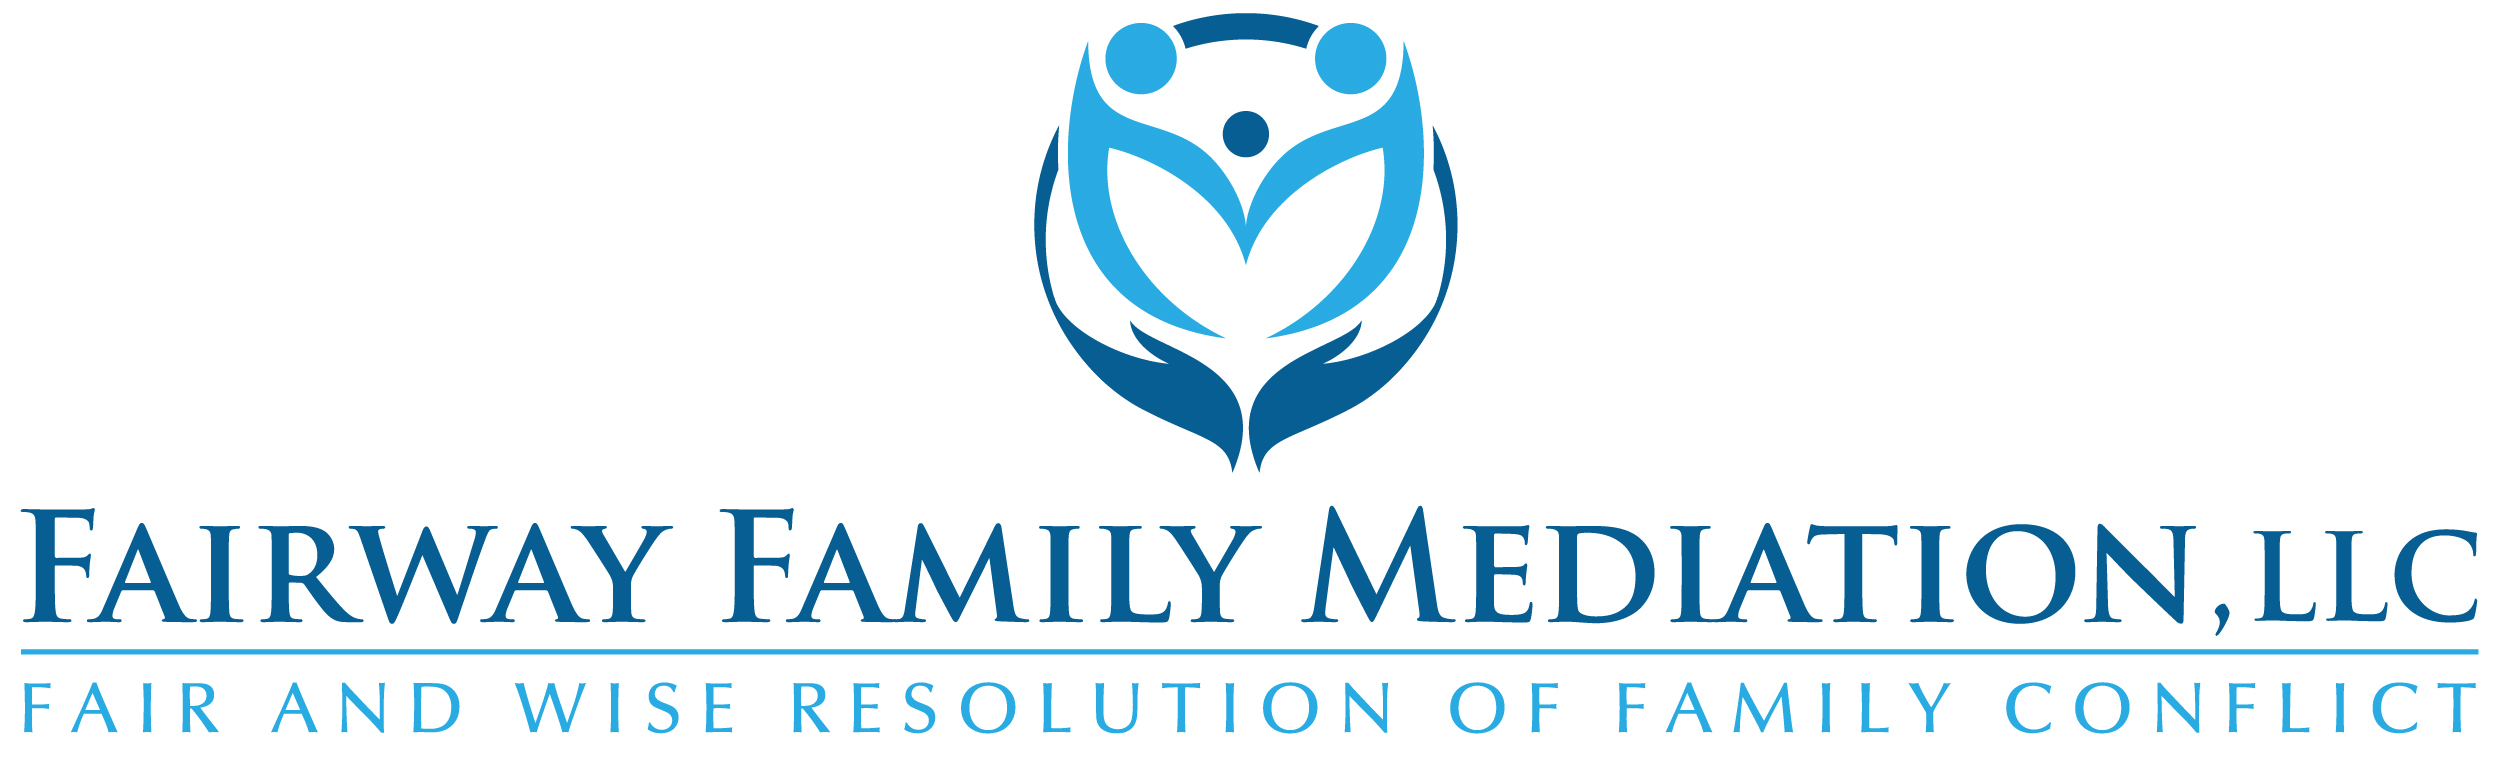 Fairway Family Mediation